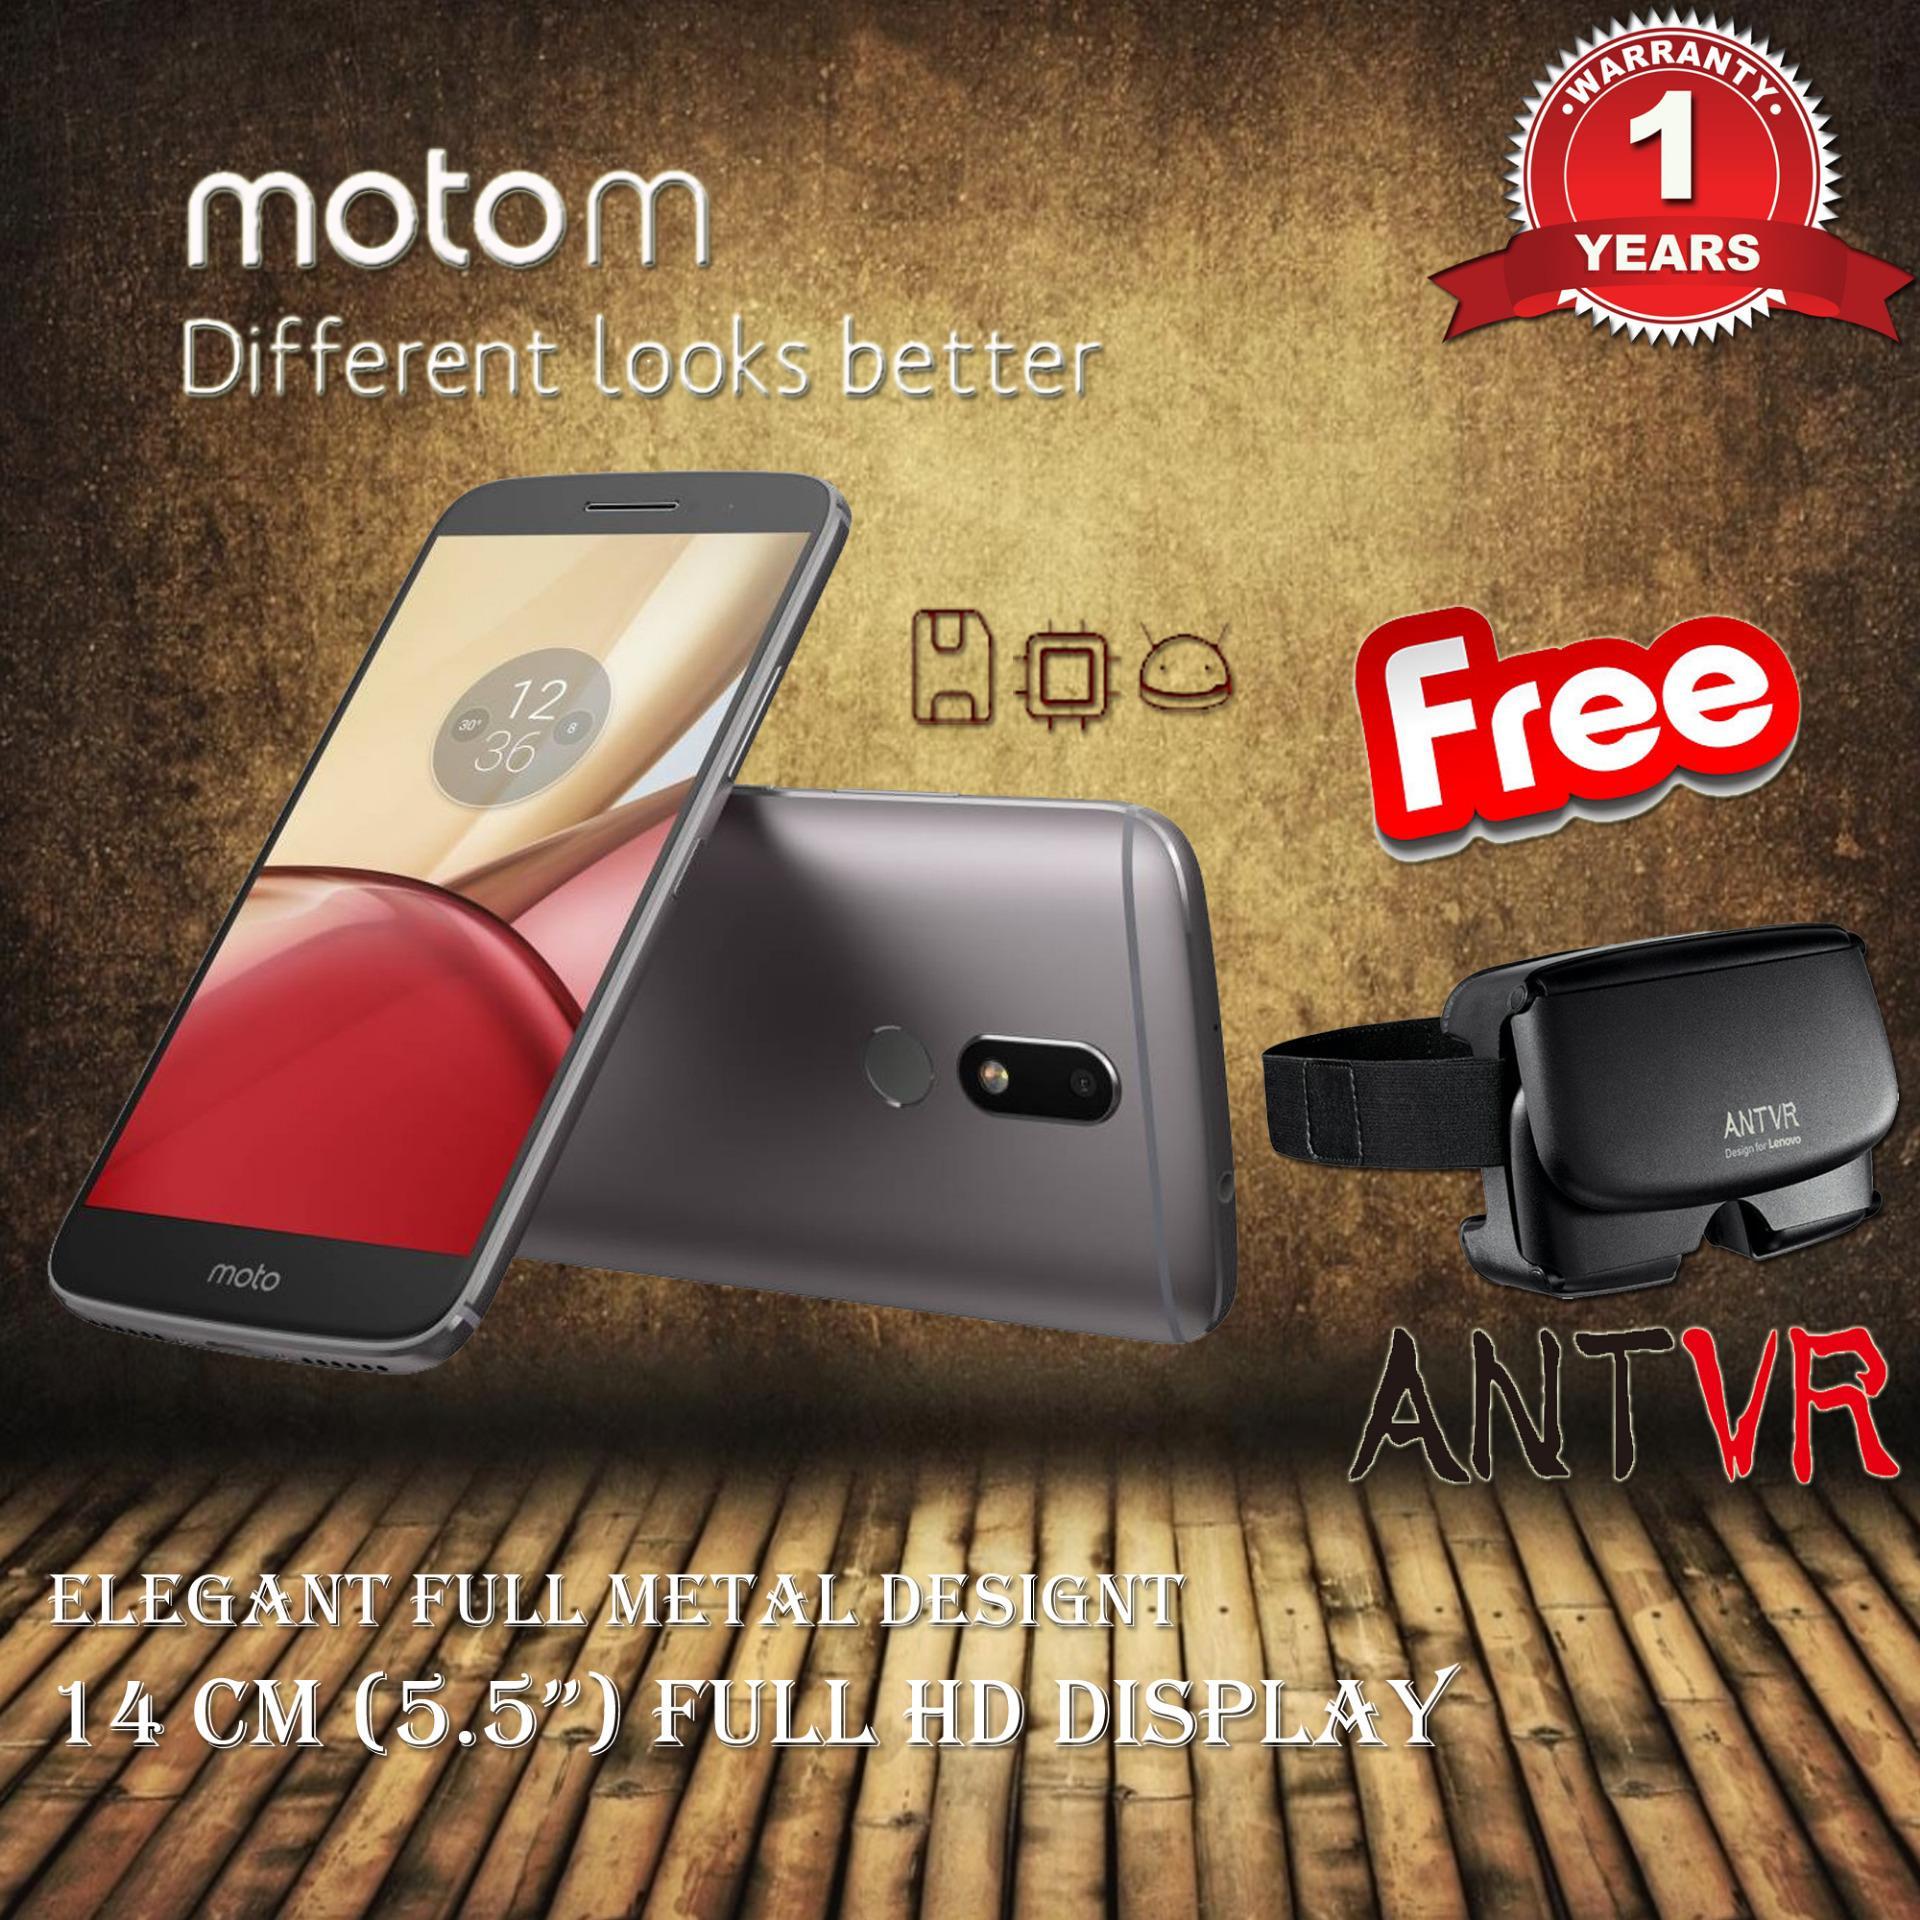 Motorola Moto M Tx1663 4gb Ram Grey Garansi Resmi Free Antvr Indonesia Z Play